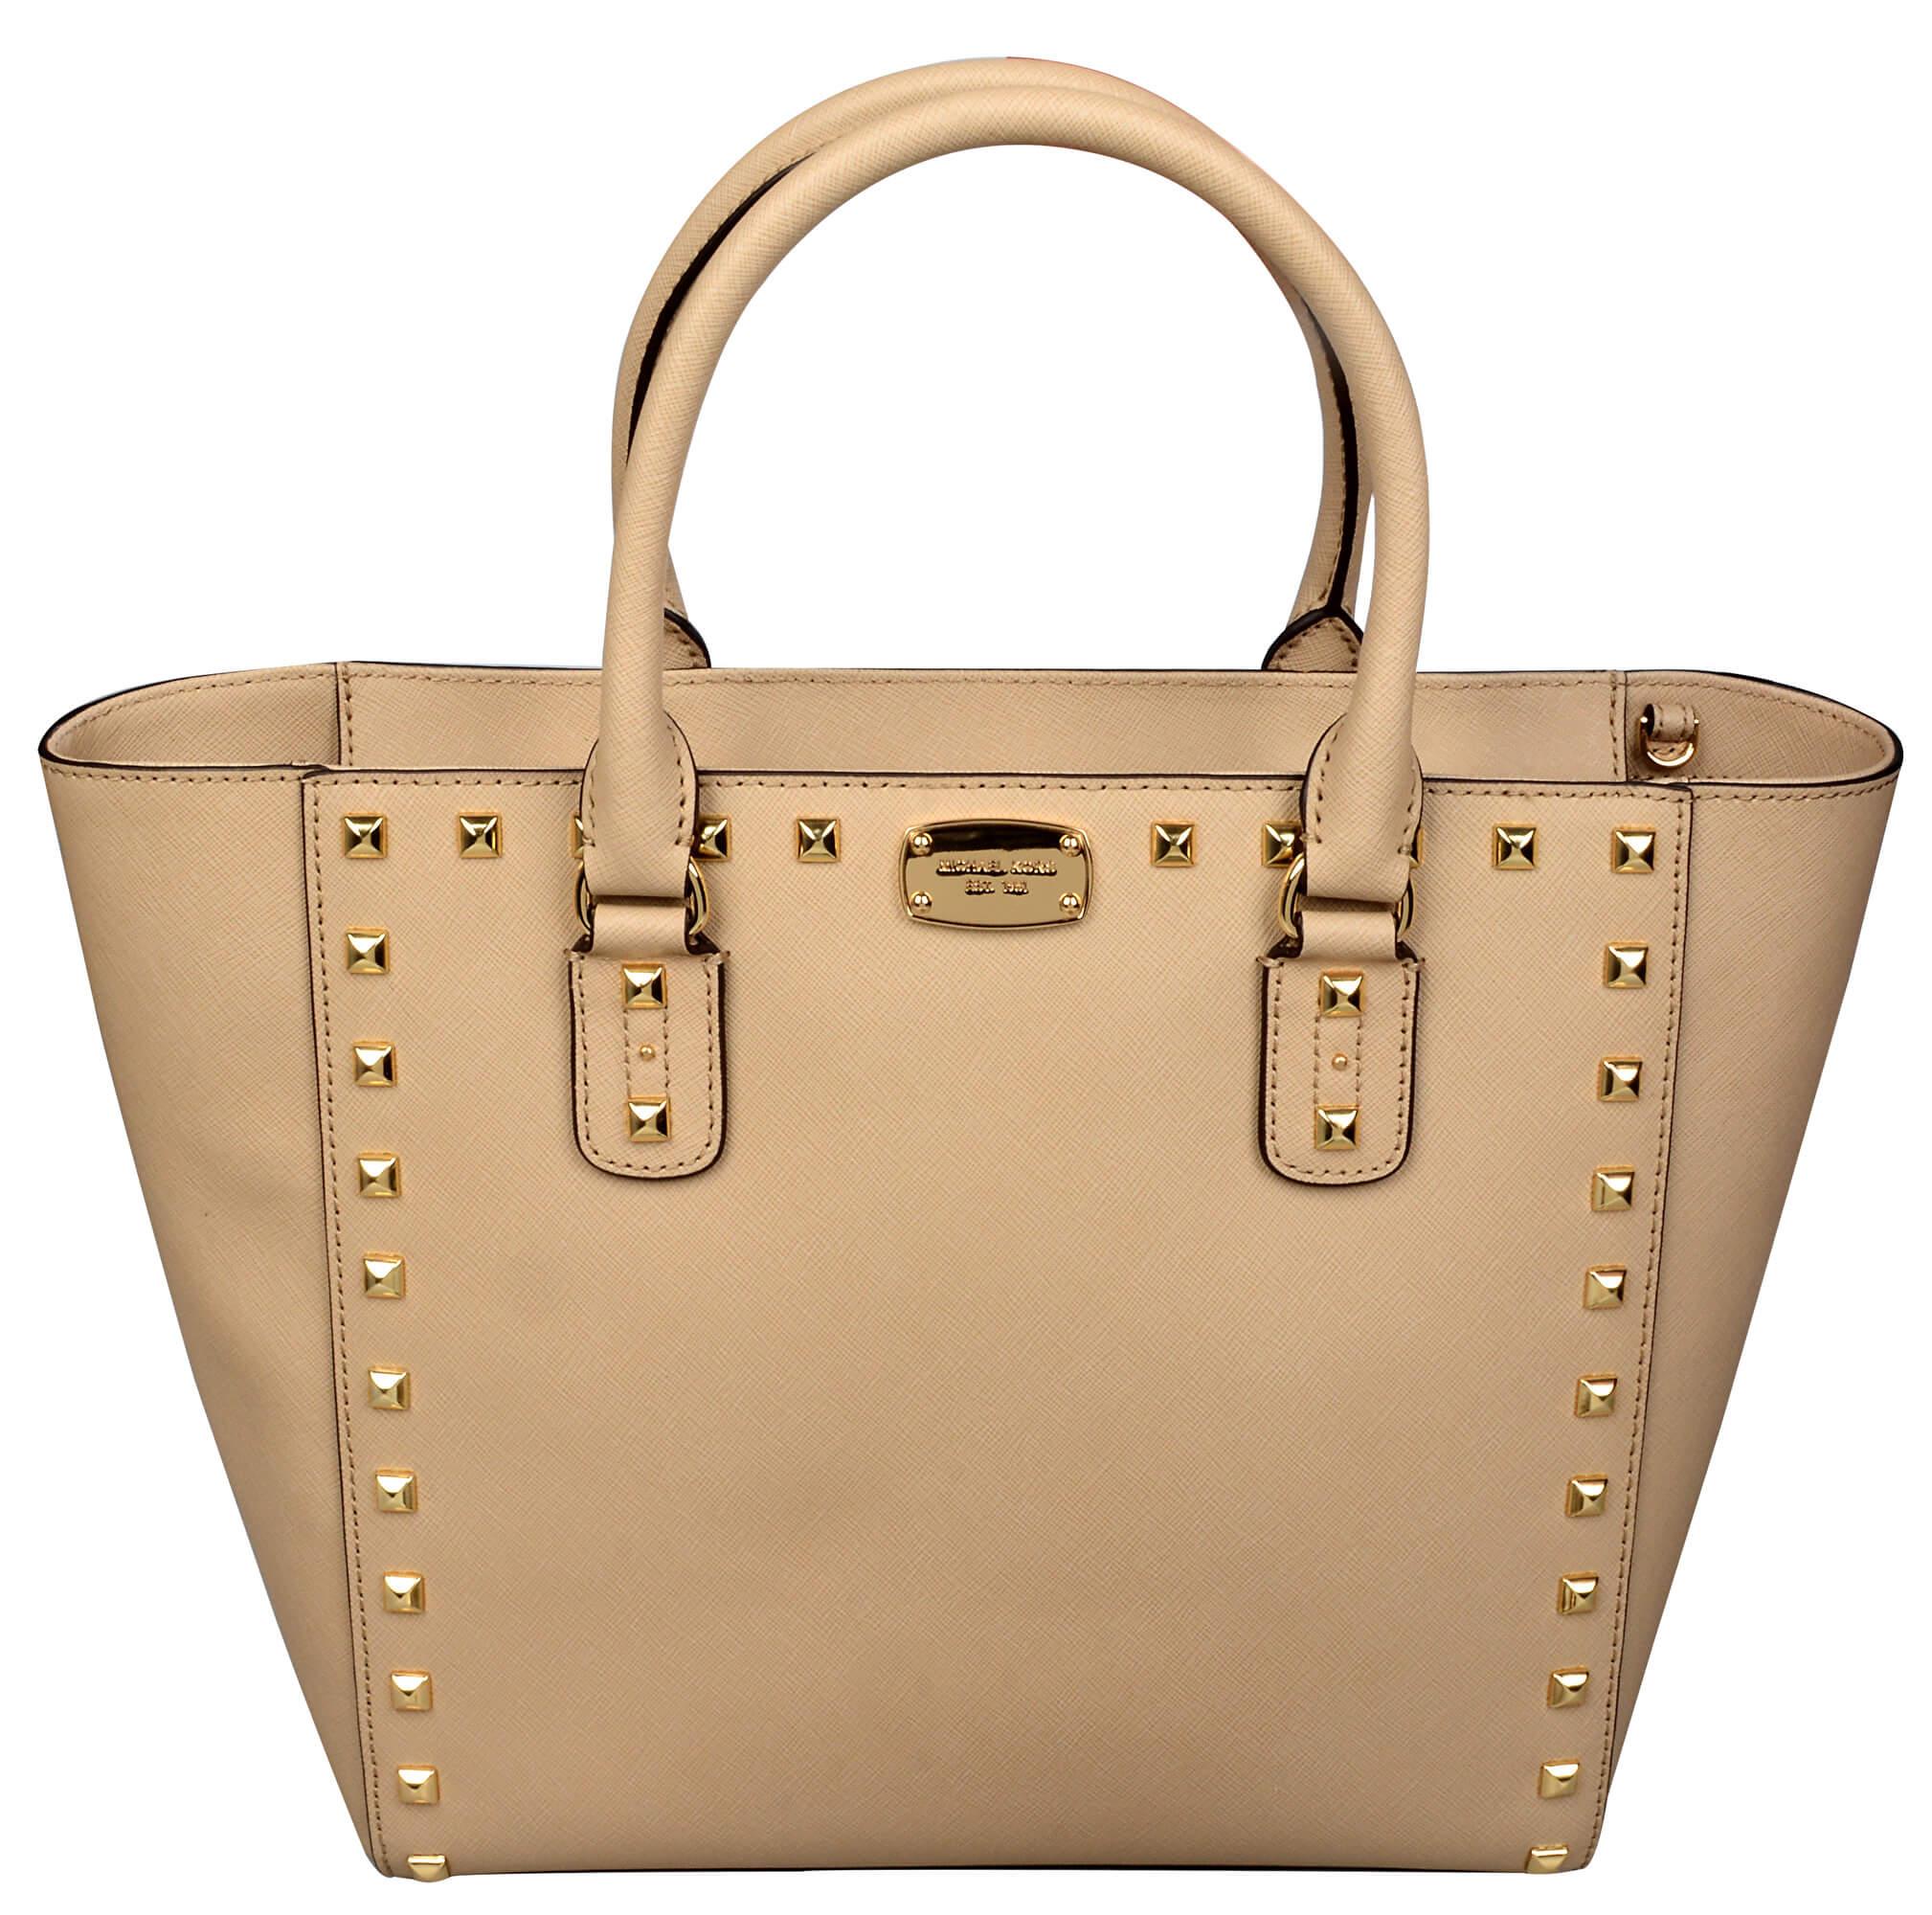 Michael Kors Luxusná kožená kabelka Sandrine Stud Saffiano Leather Studded  Large Tote Bag - Beige 293bc6b2f15